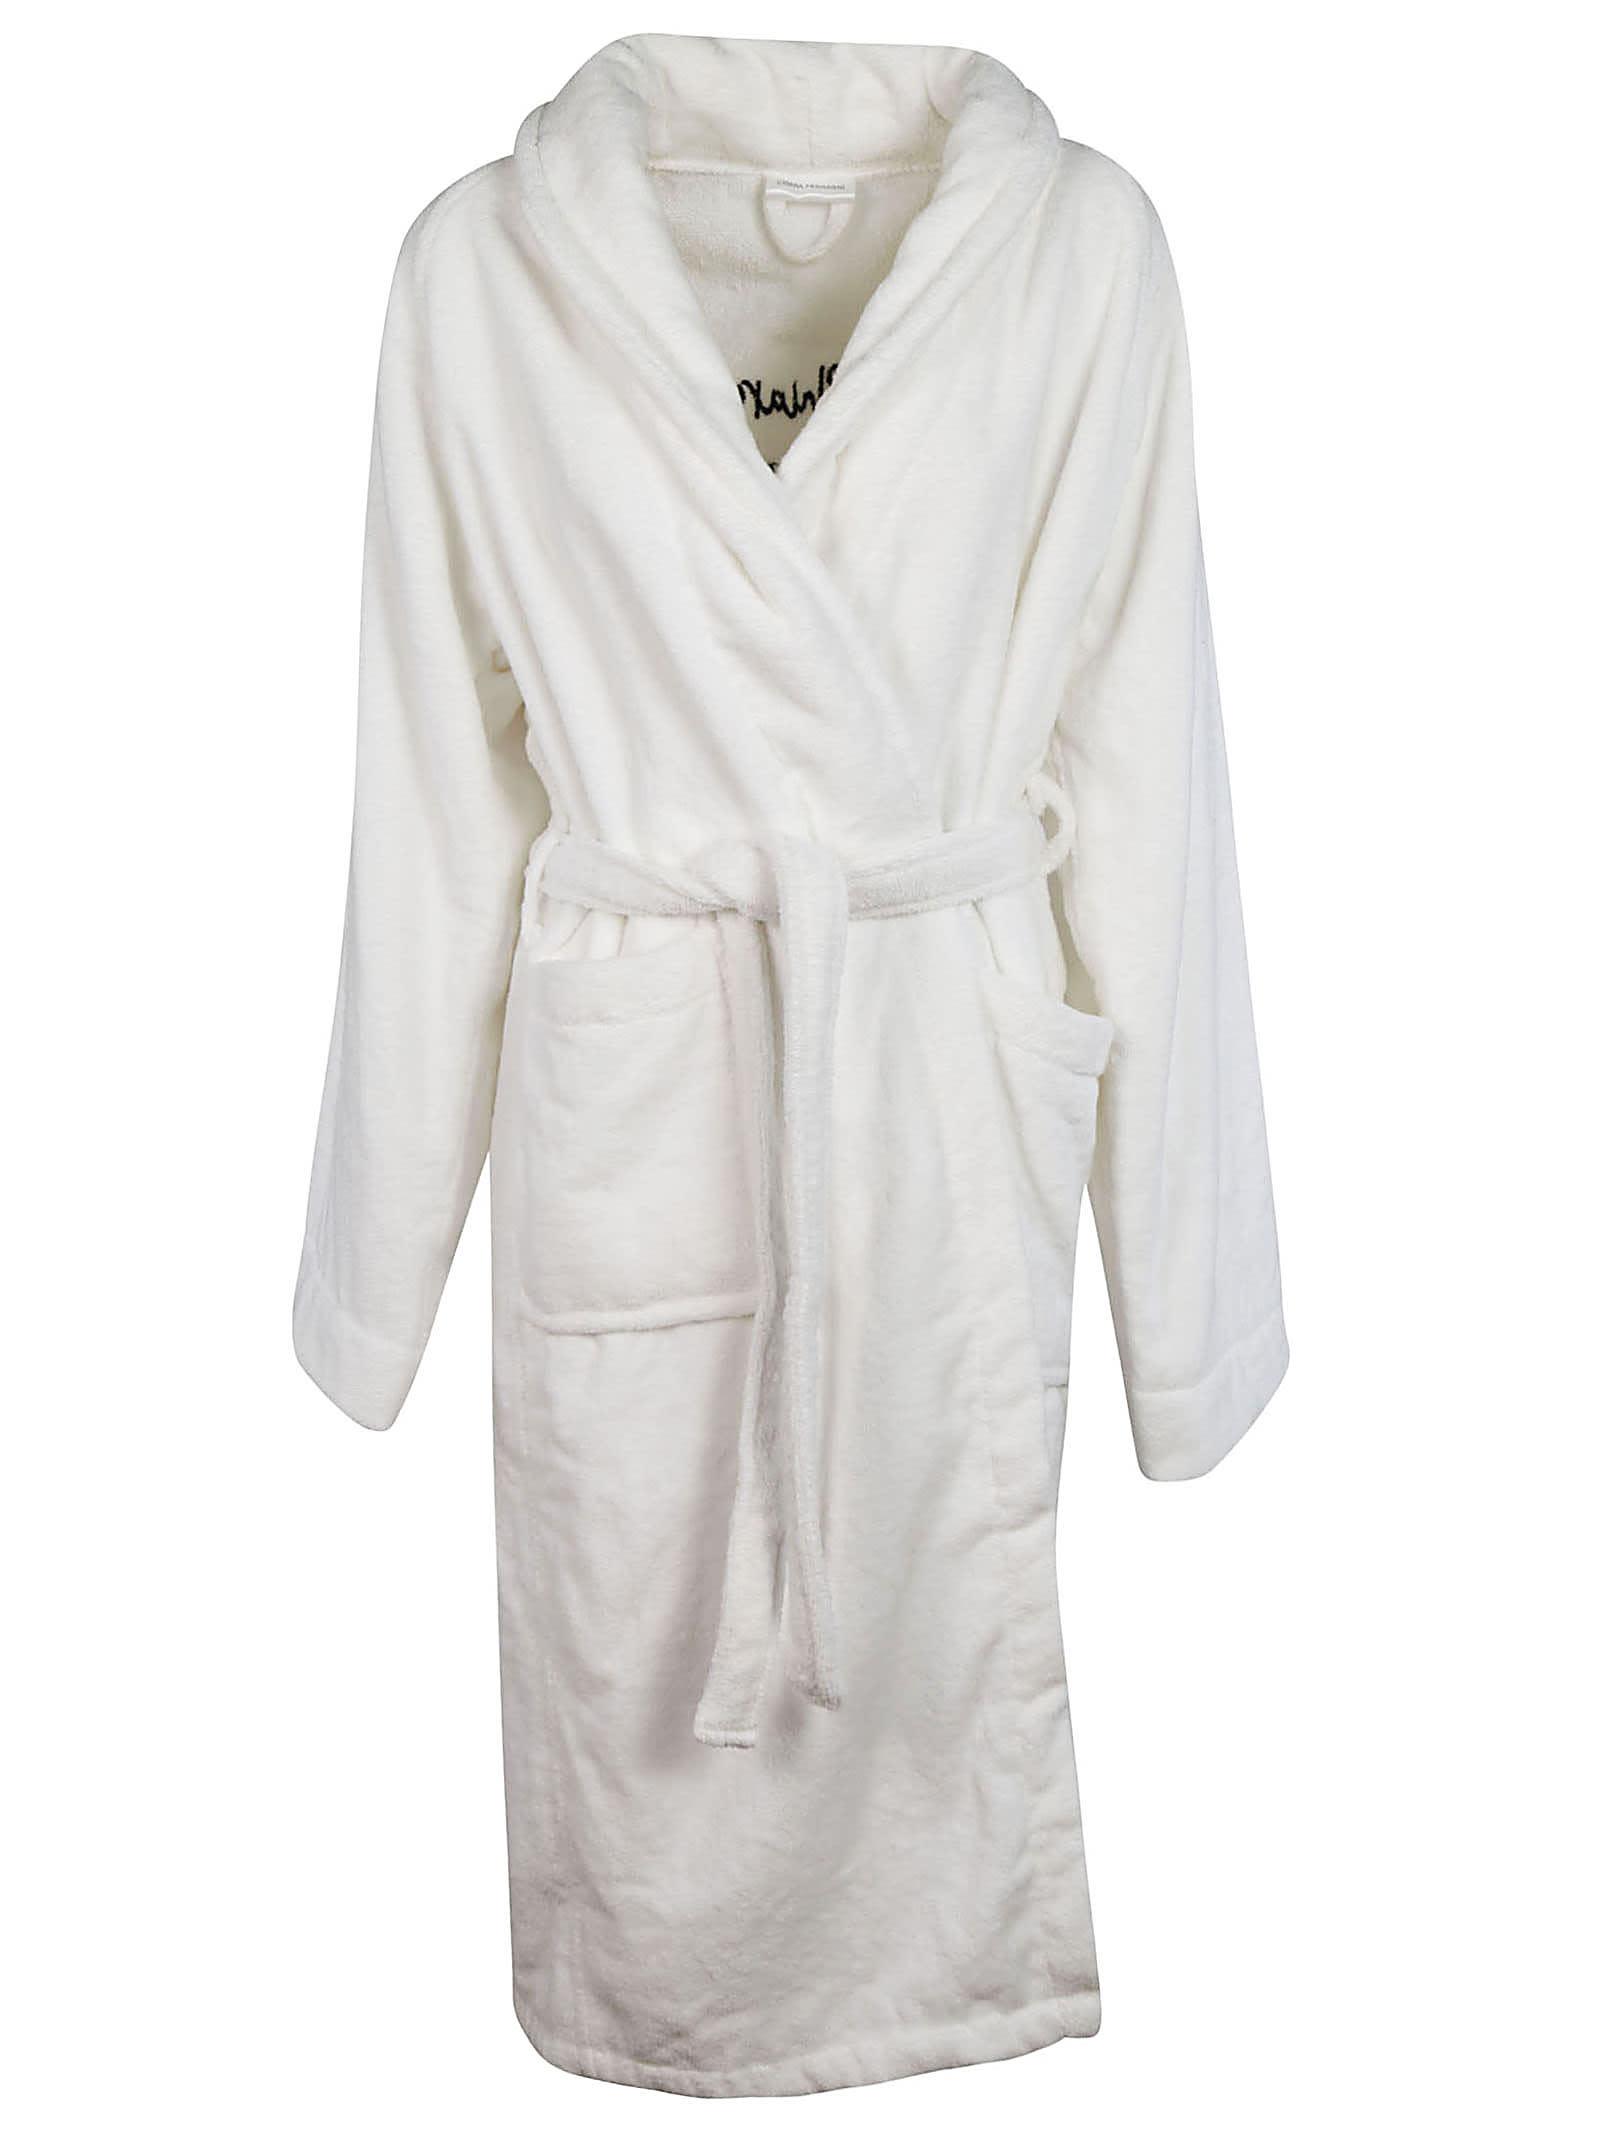 Buy Chiara Ferragni Belted Waist Dress online, shop Chiara Ferragni with free shipping